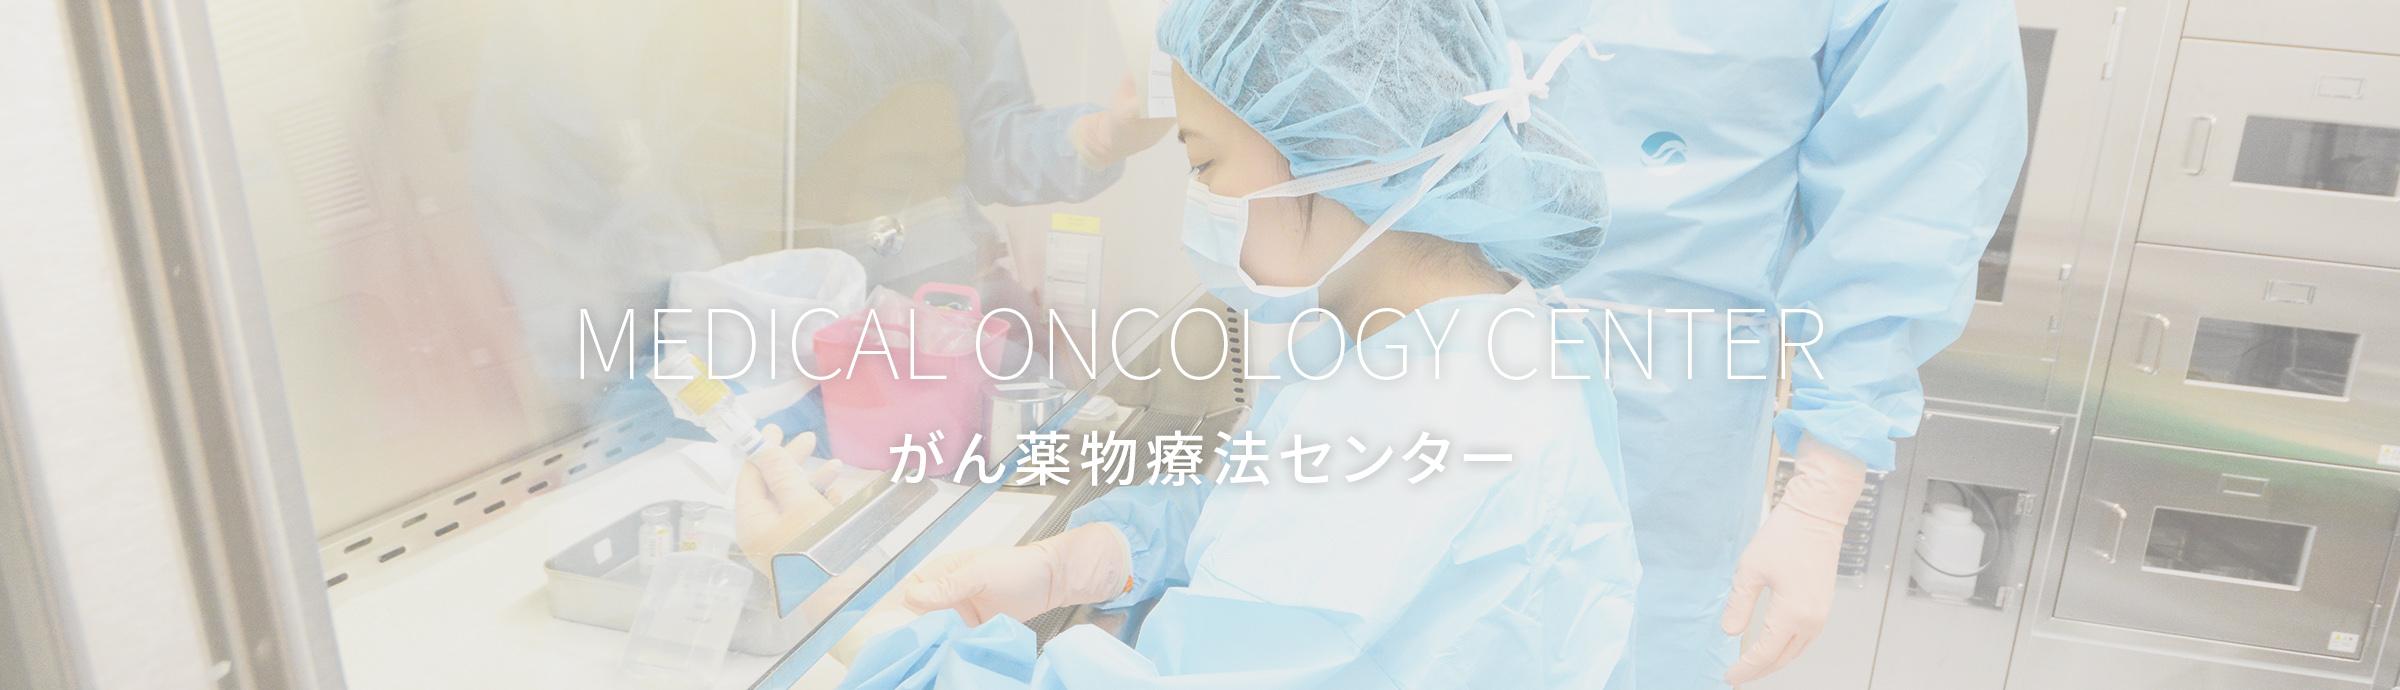 MEDICAL ONCOLOGY CENTER がん薬物療法センター